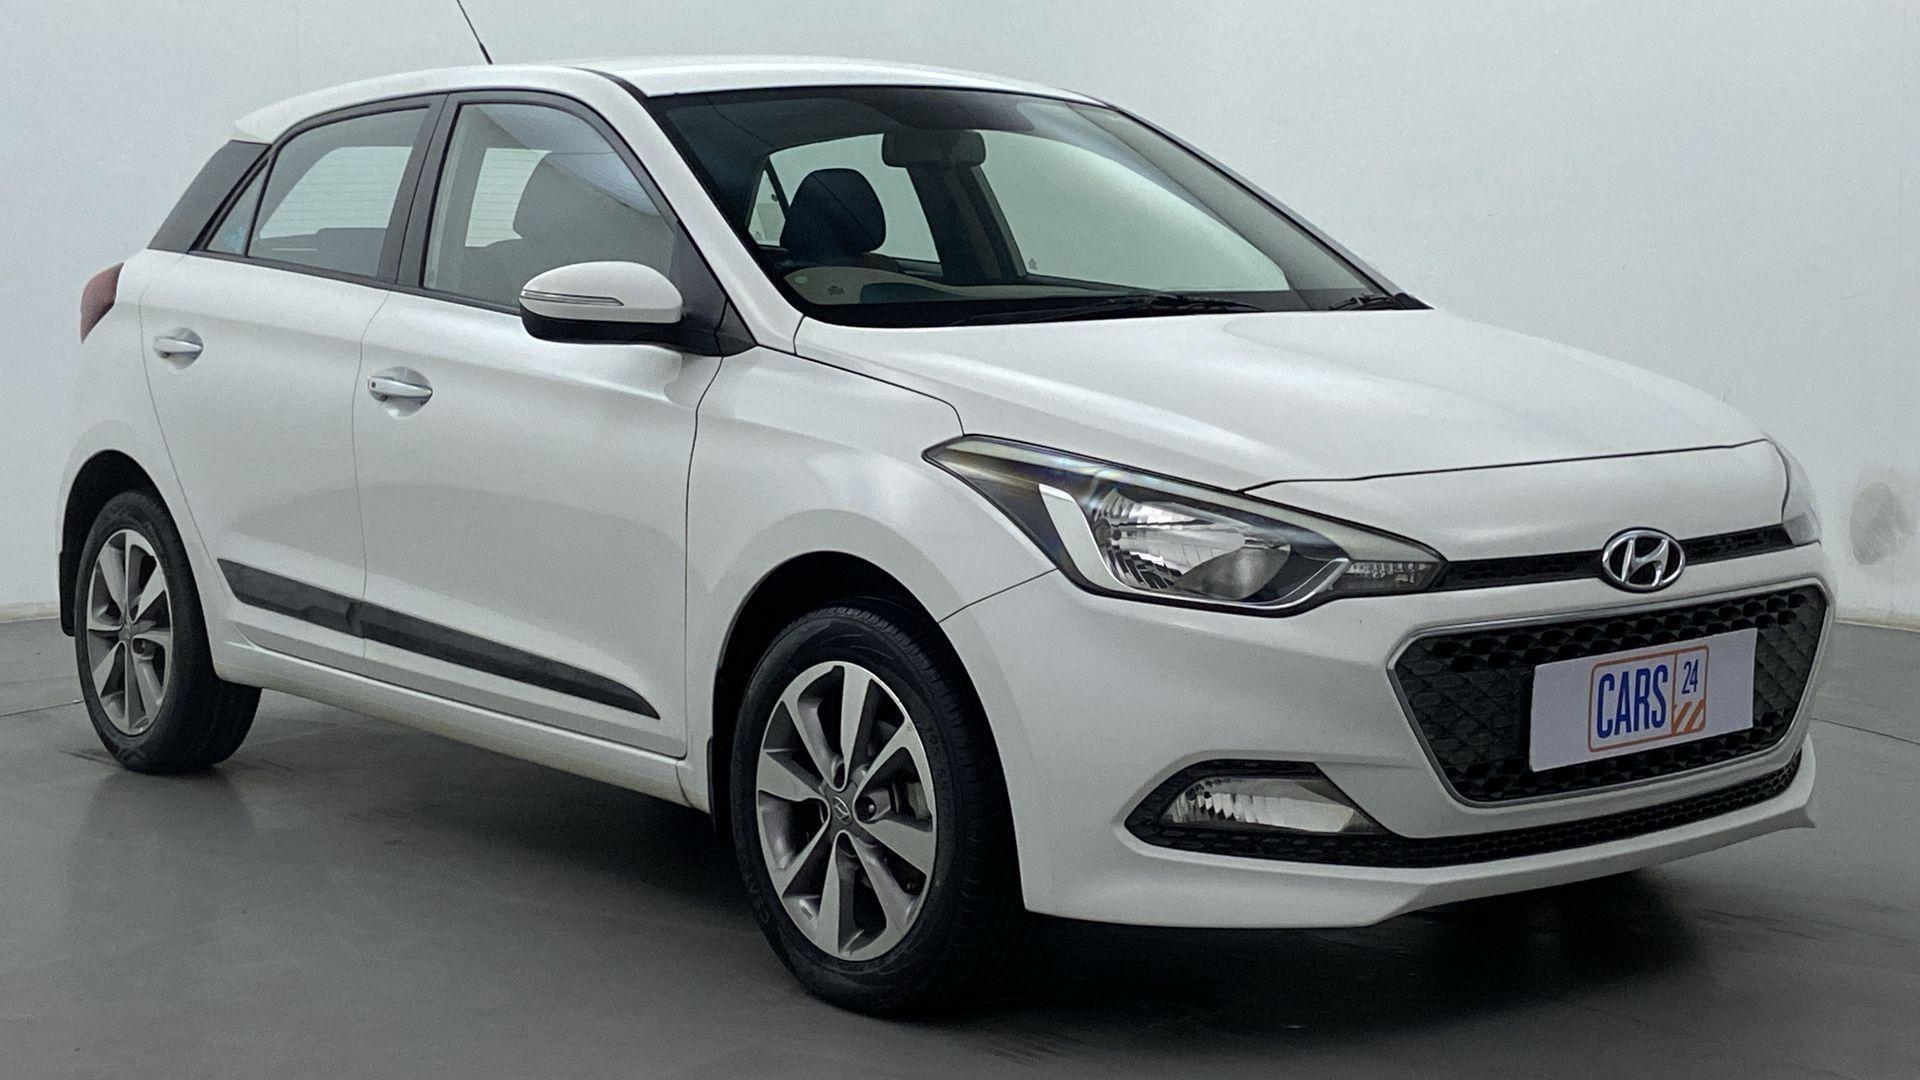 2015 Hyundai Elite i20 ASTA 1.2